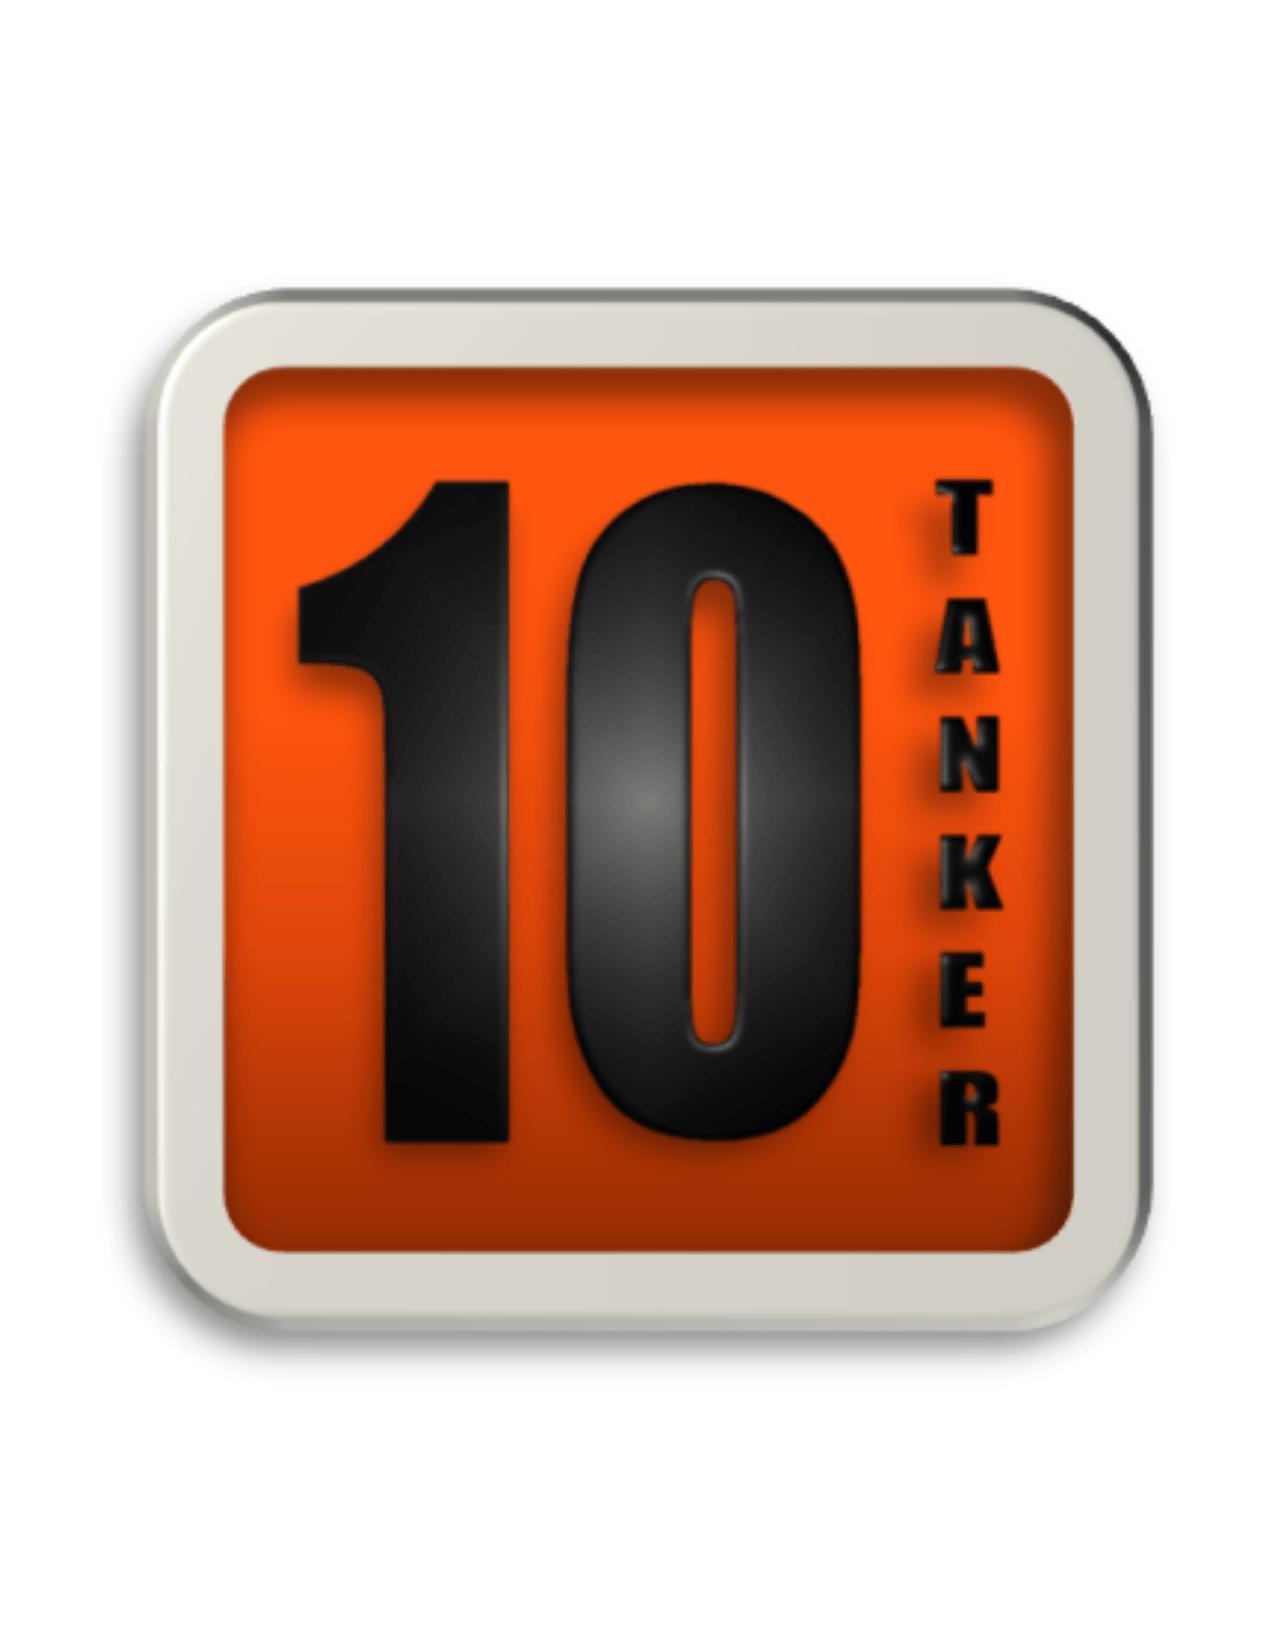 10 Tanker Air Carrier